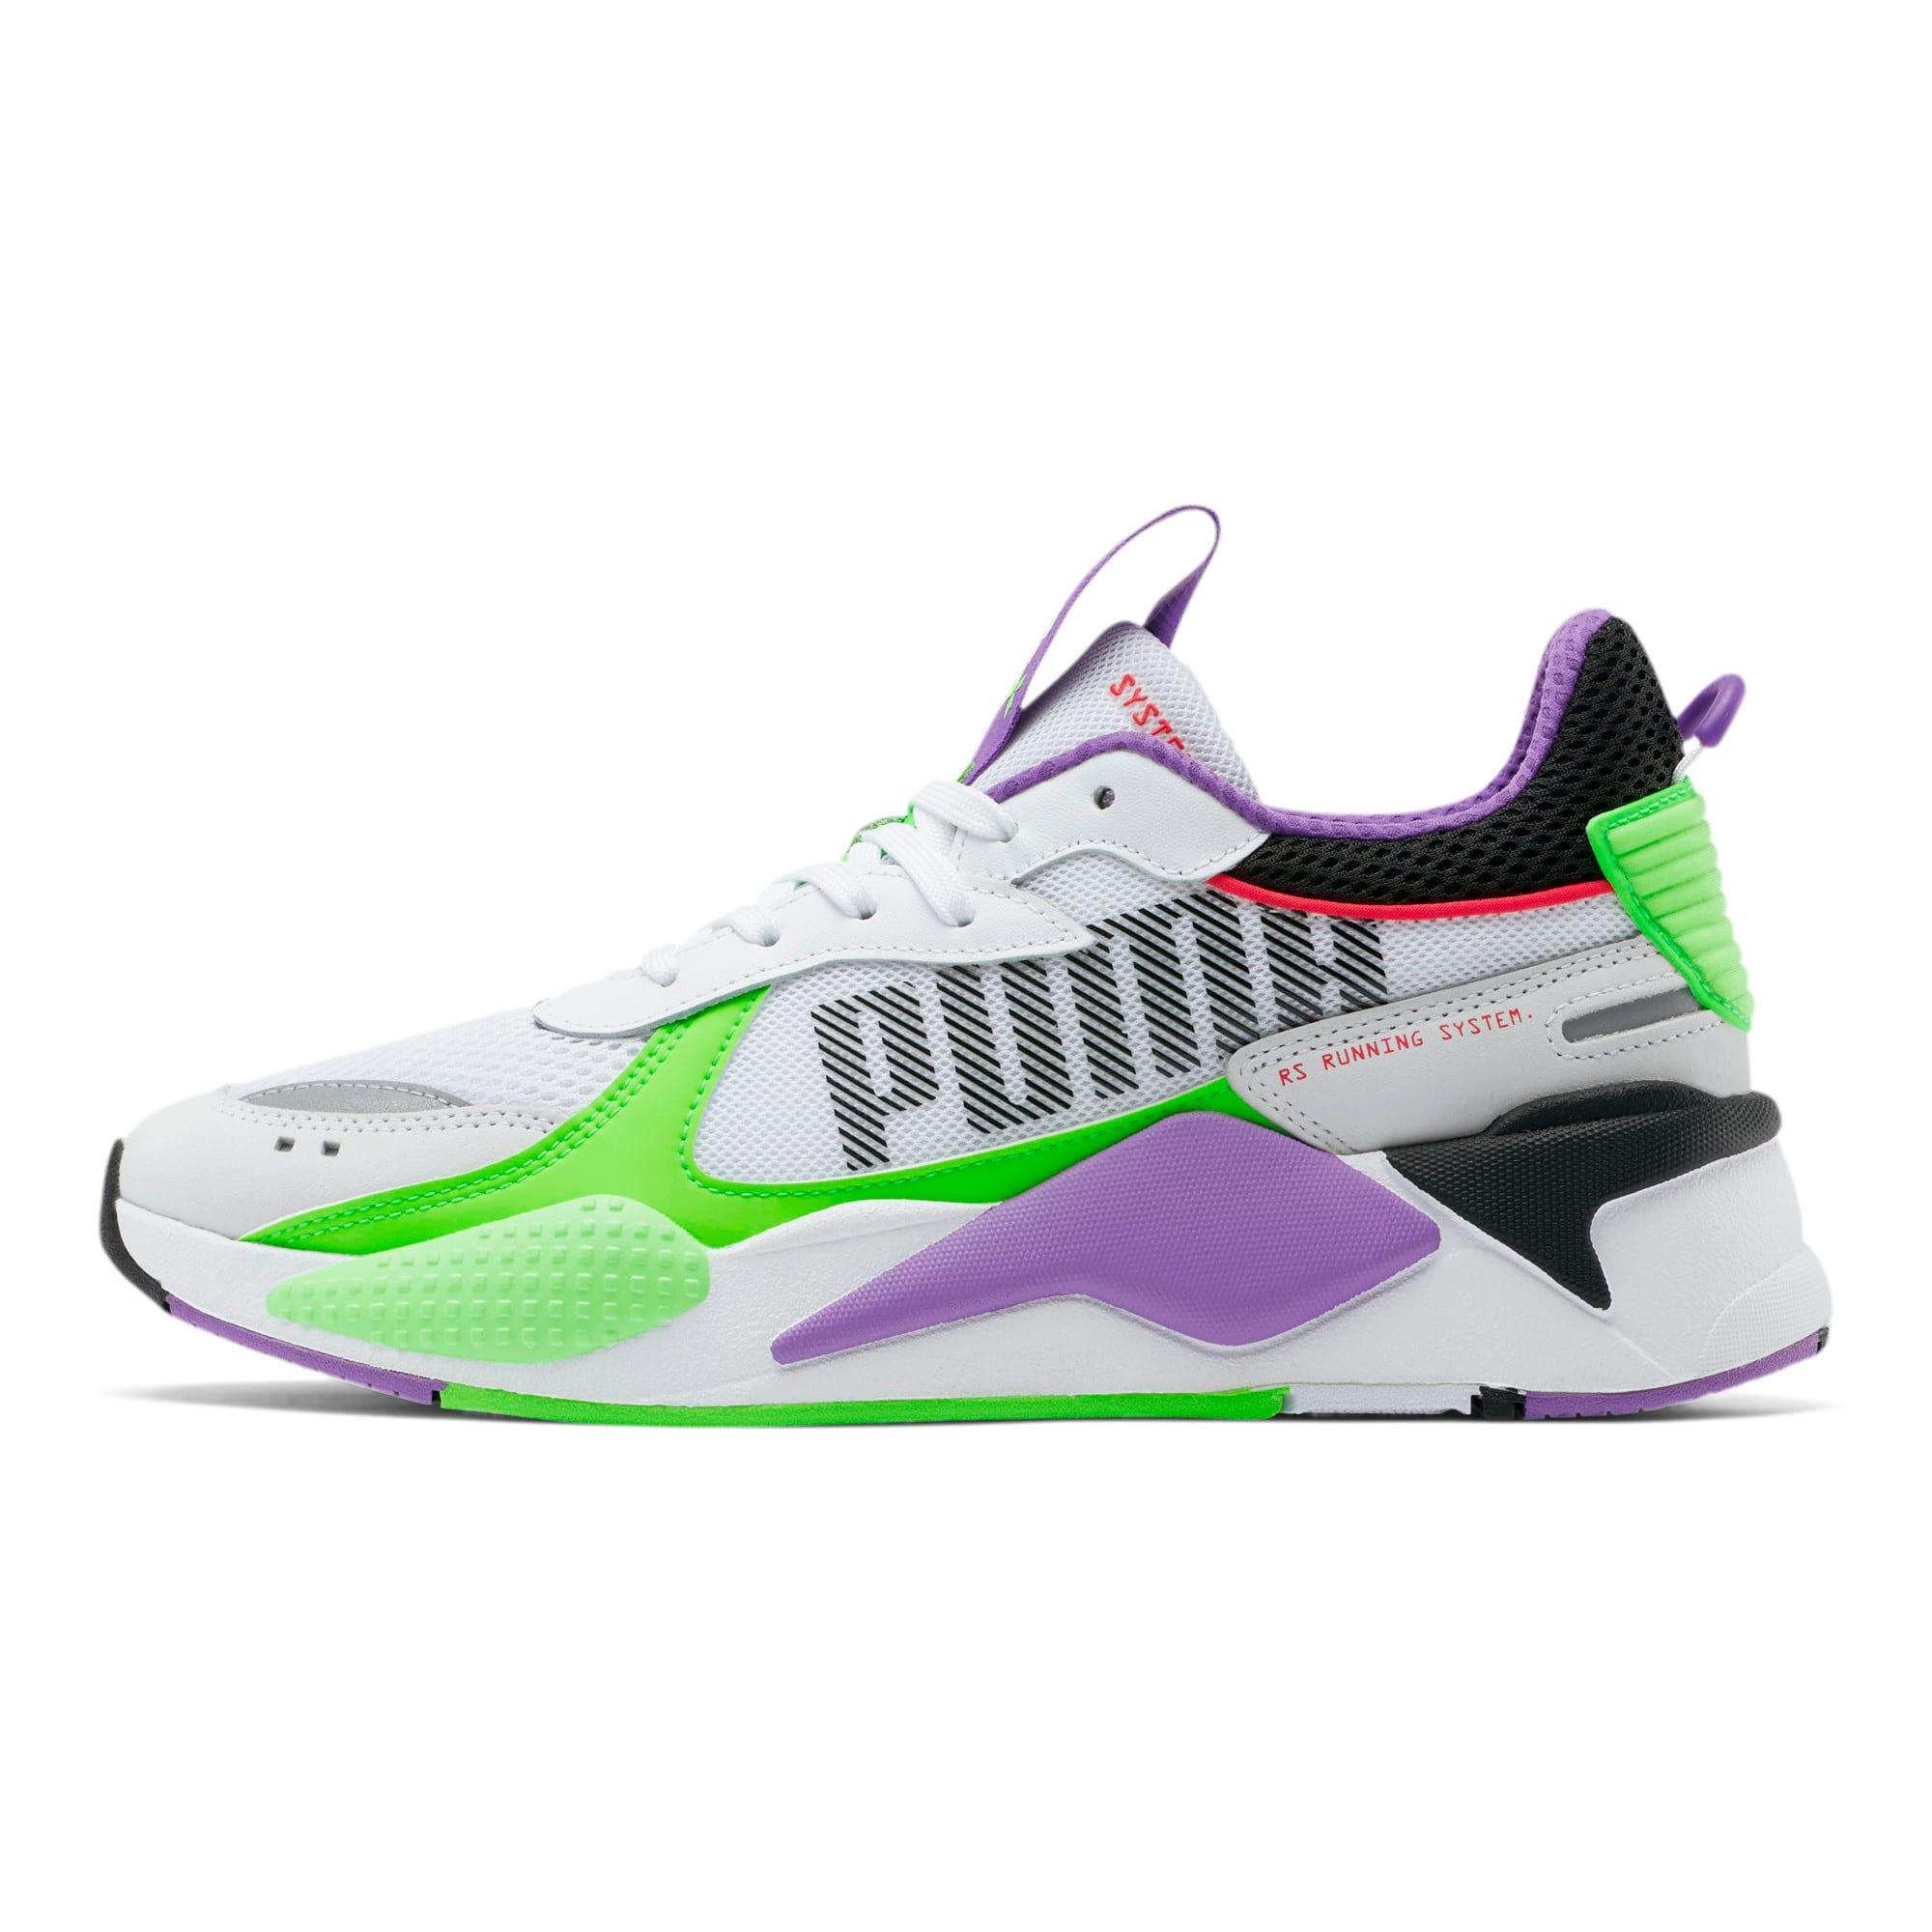 Thumbnail 1 of RS-X Bold Sneakers, PWhite-Gr Gecko-Royal Lilac, medium